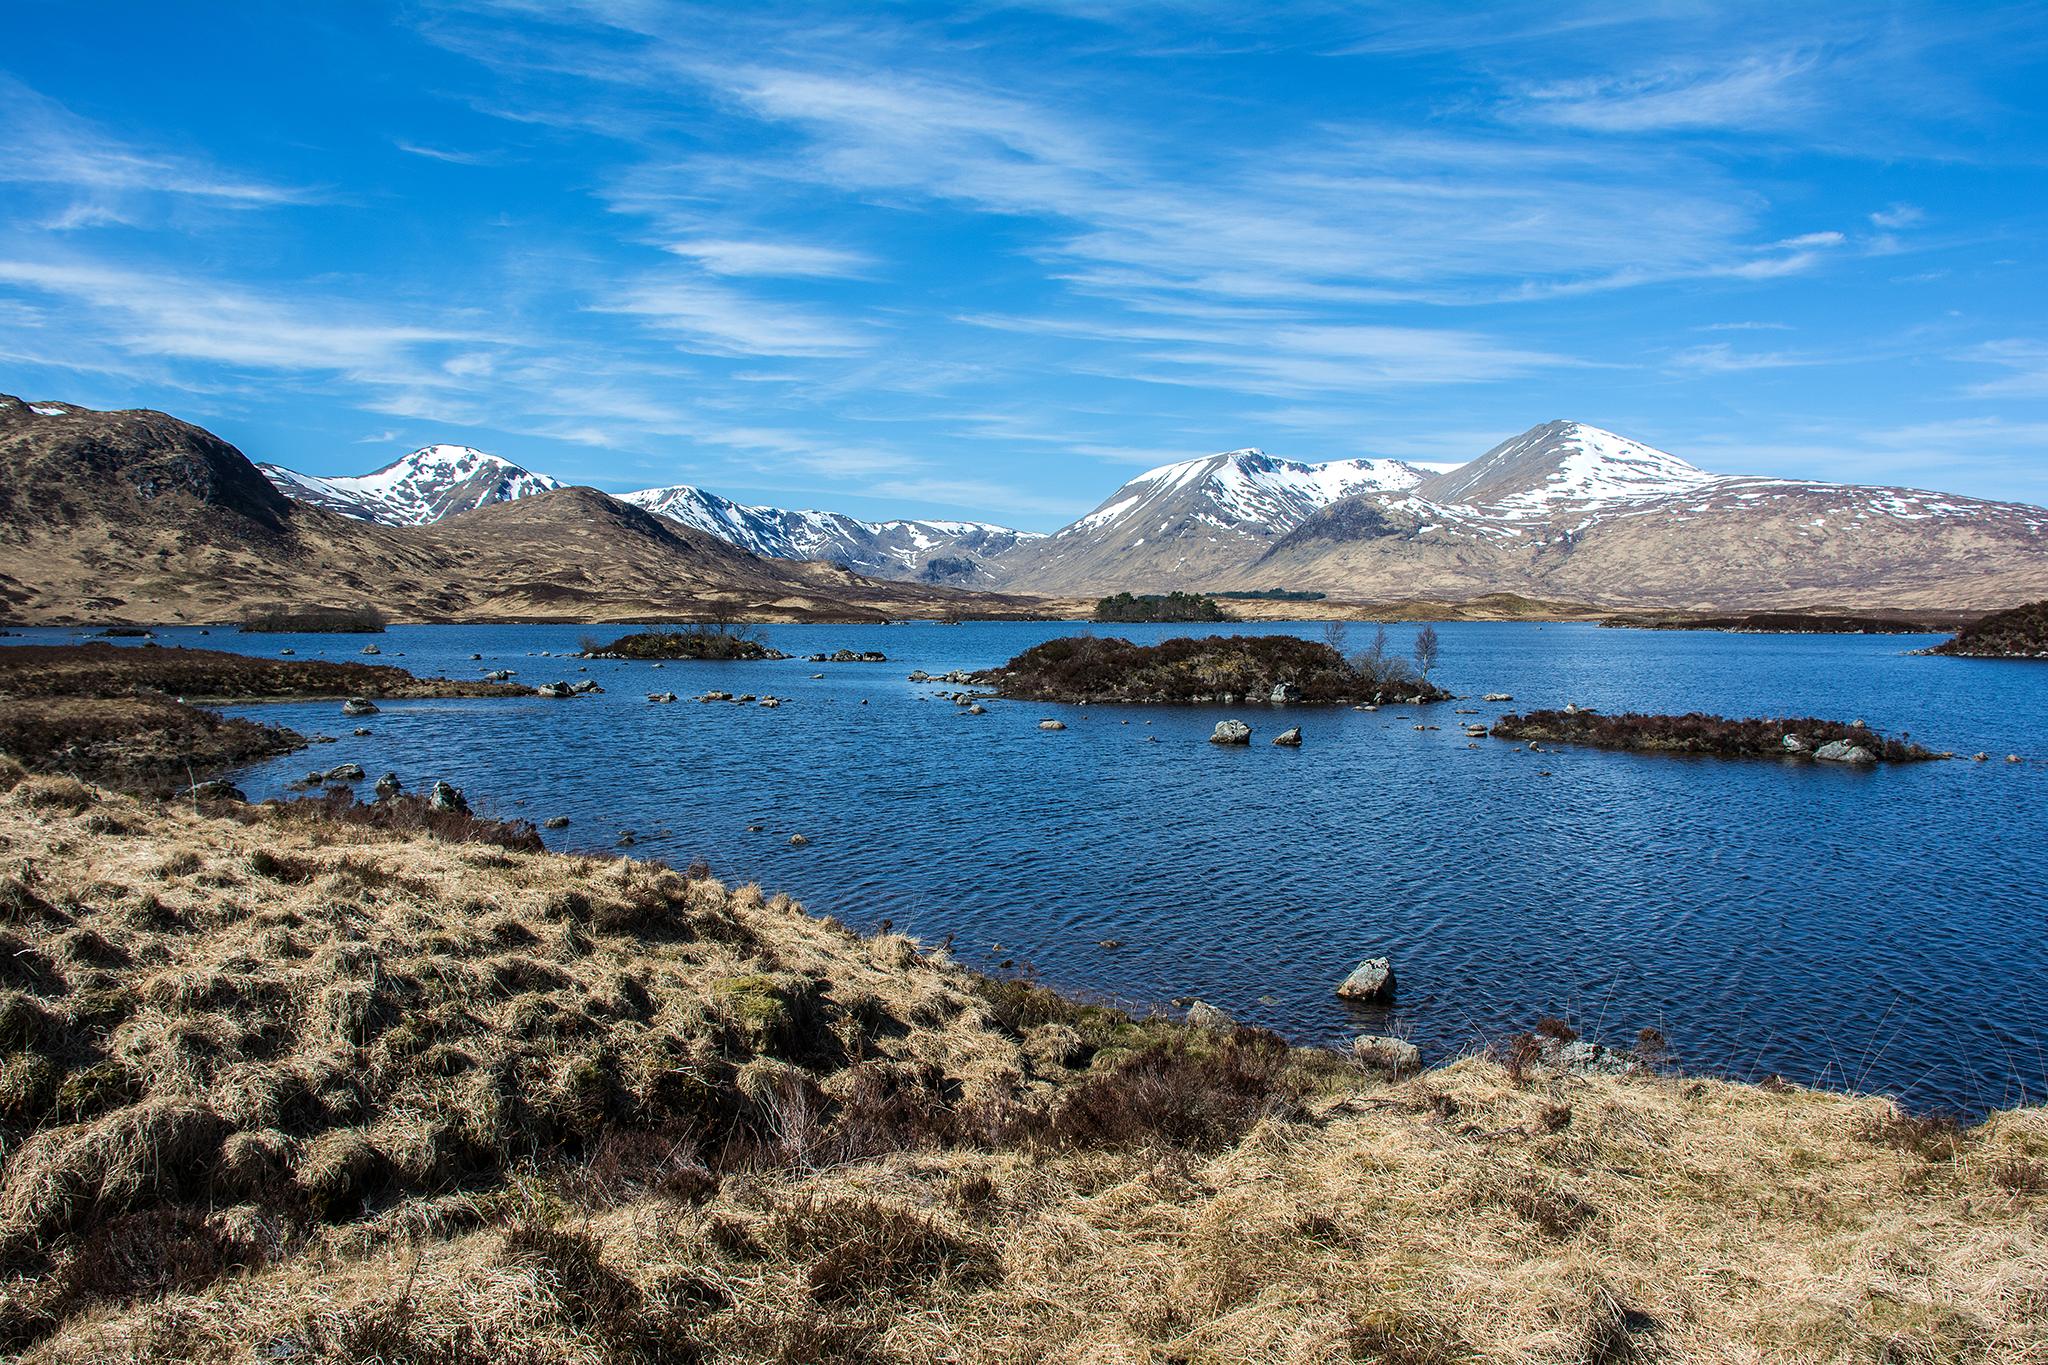 Lochan na h-Achlaise, Scotland, United Kingdom